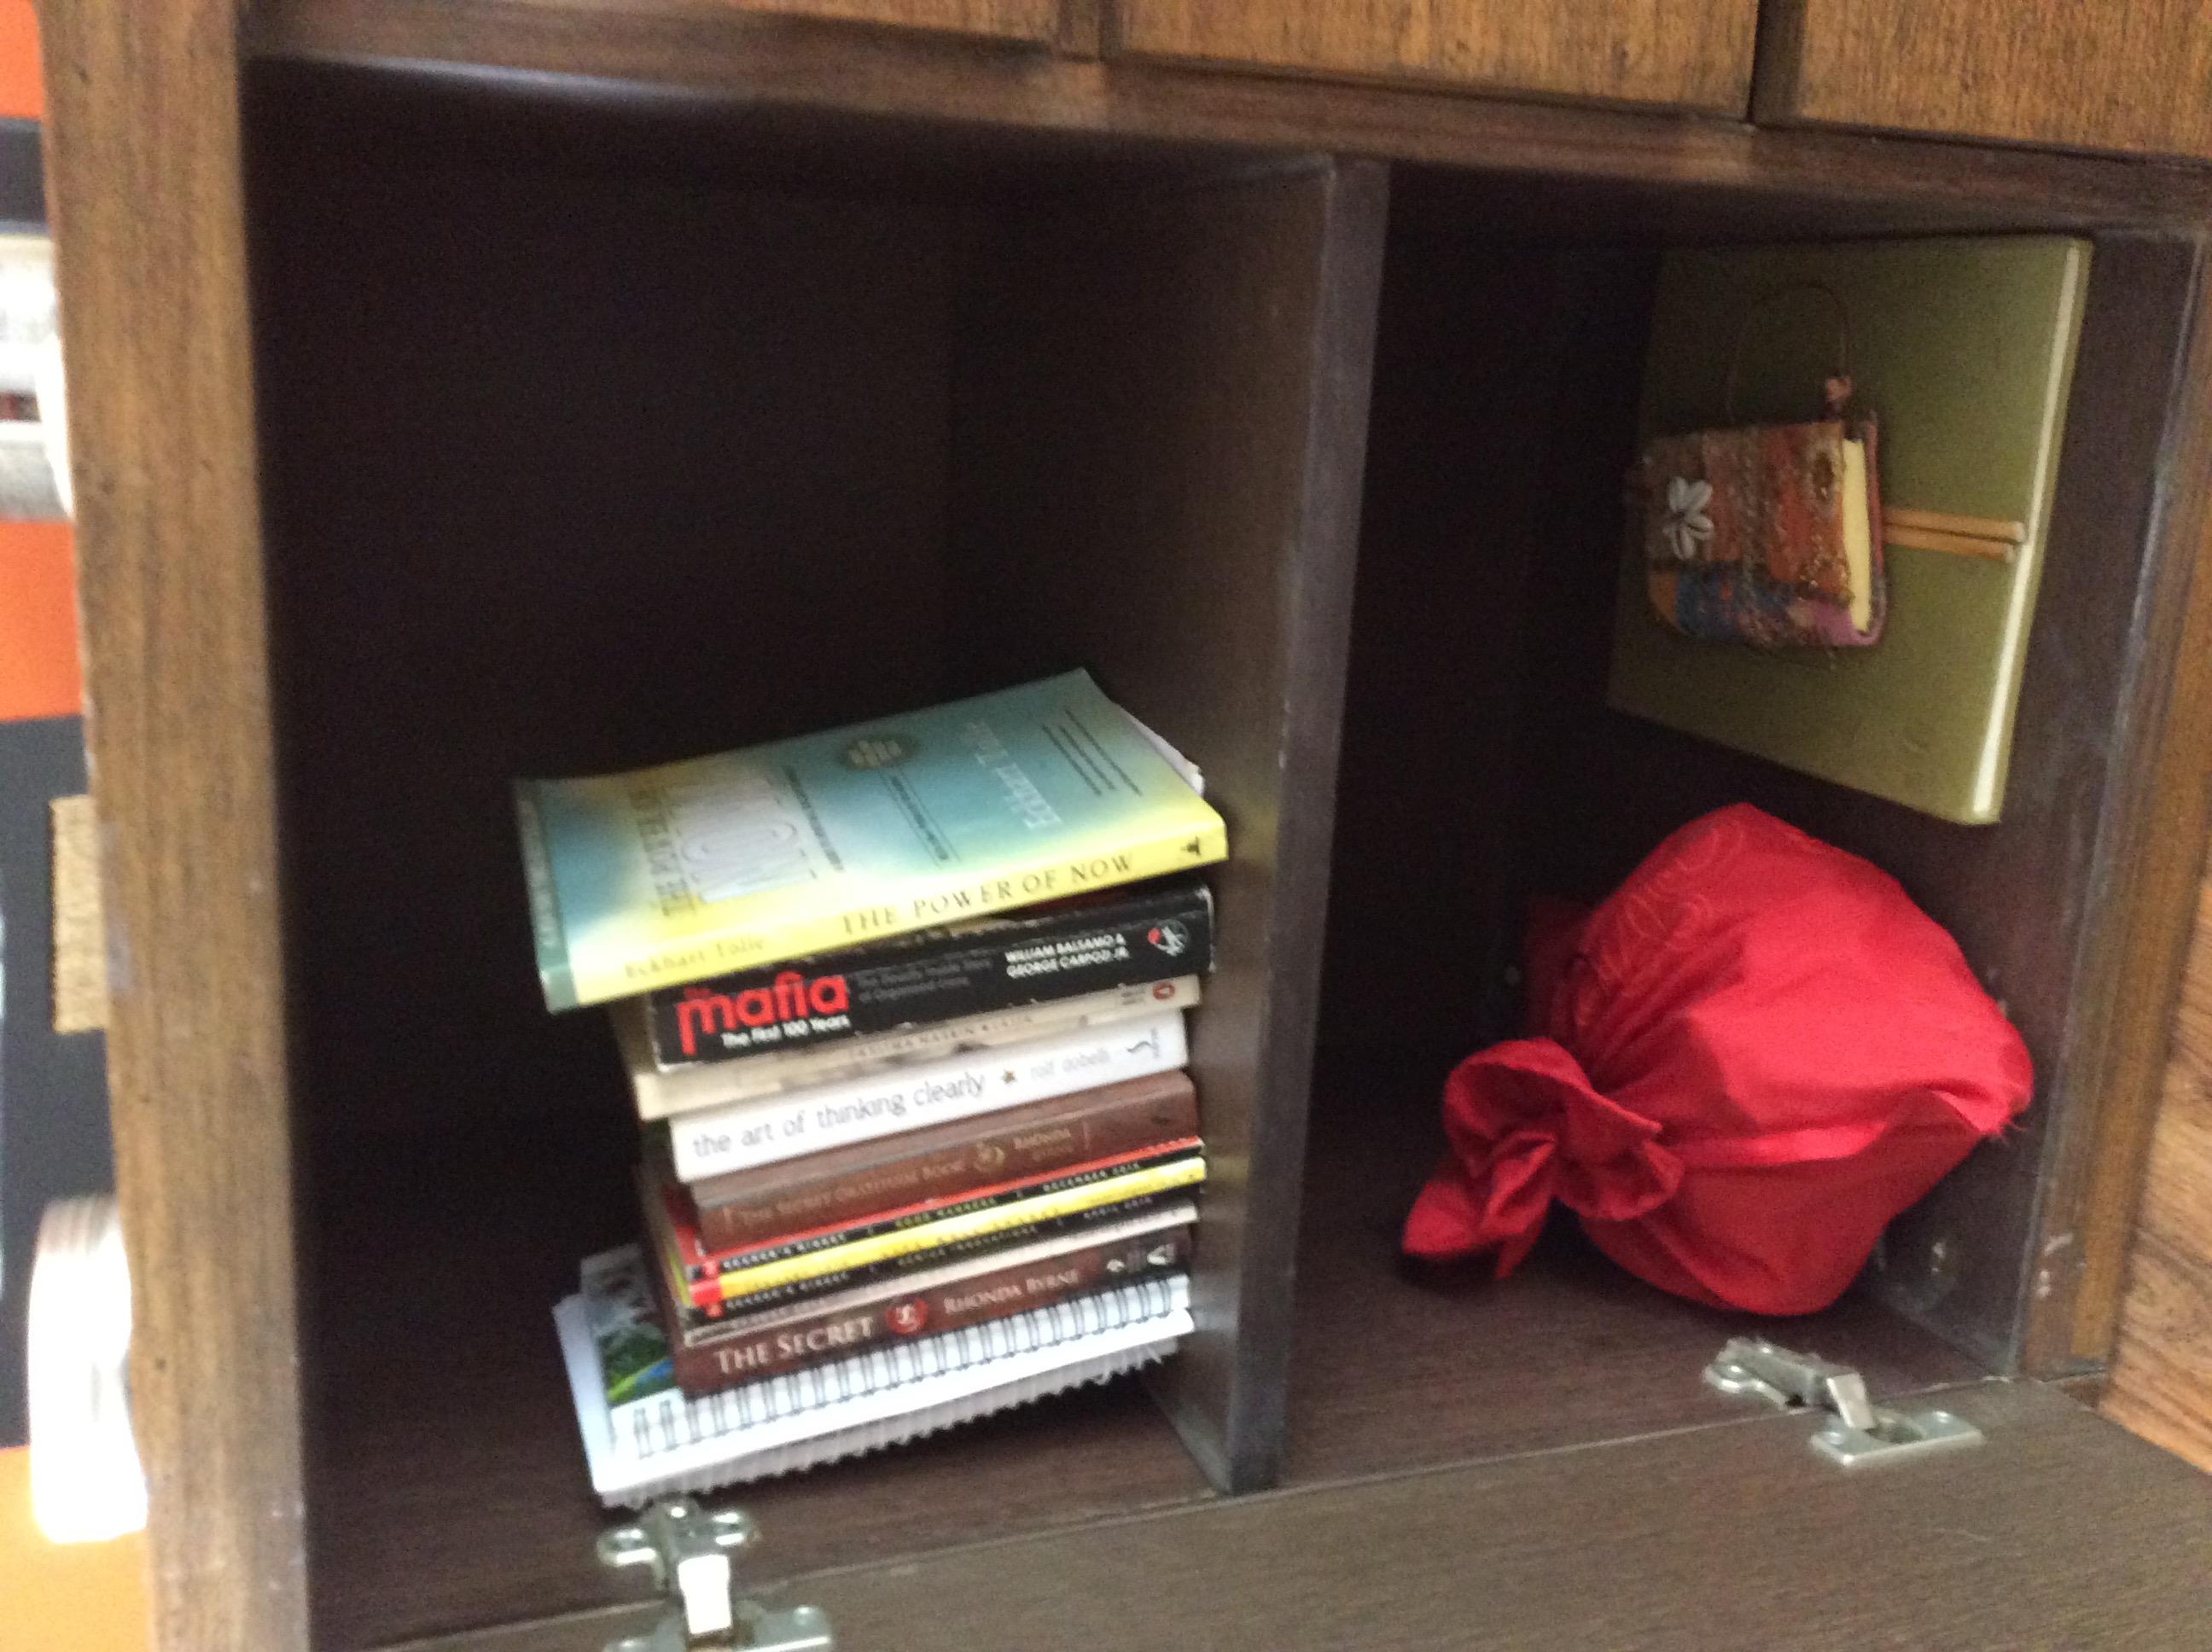 Shelf- in order